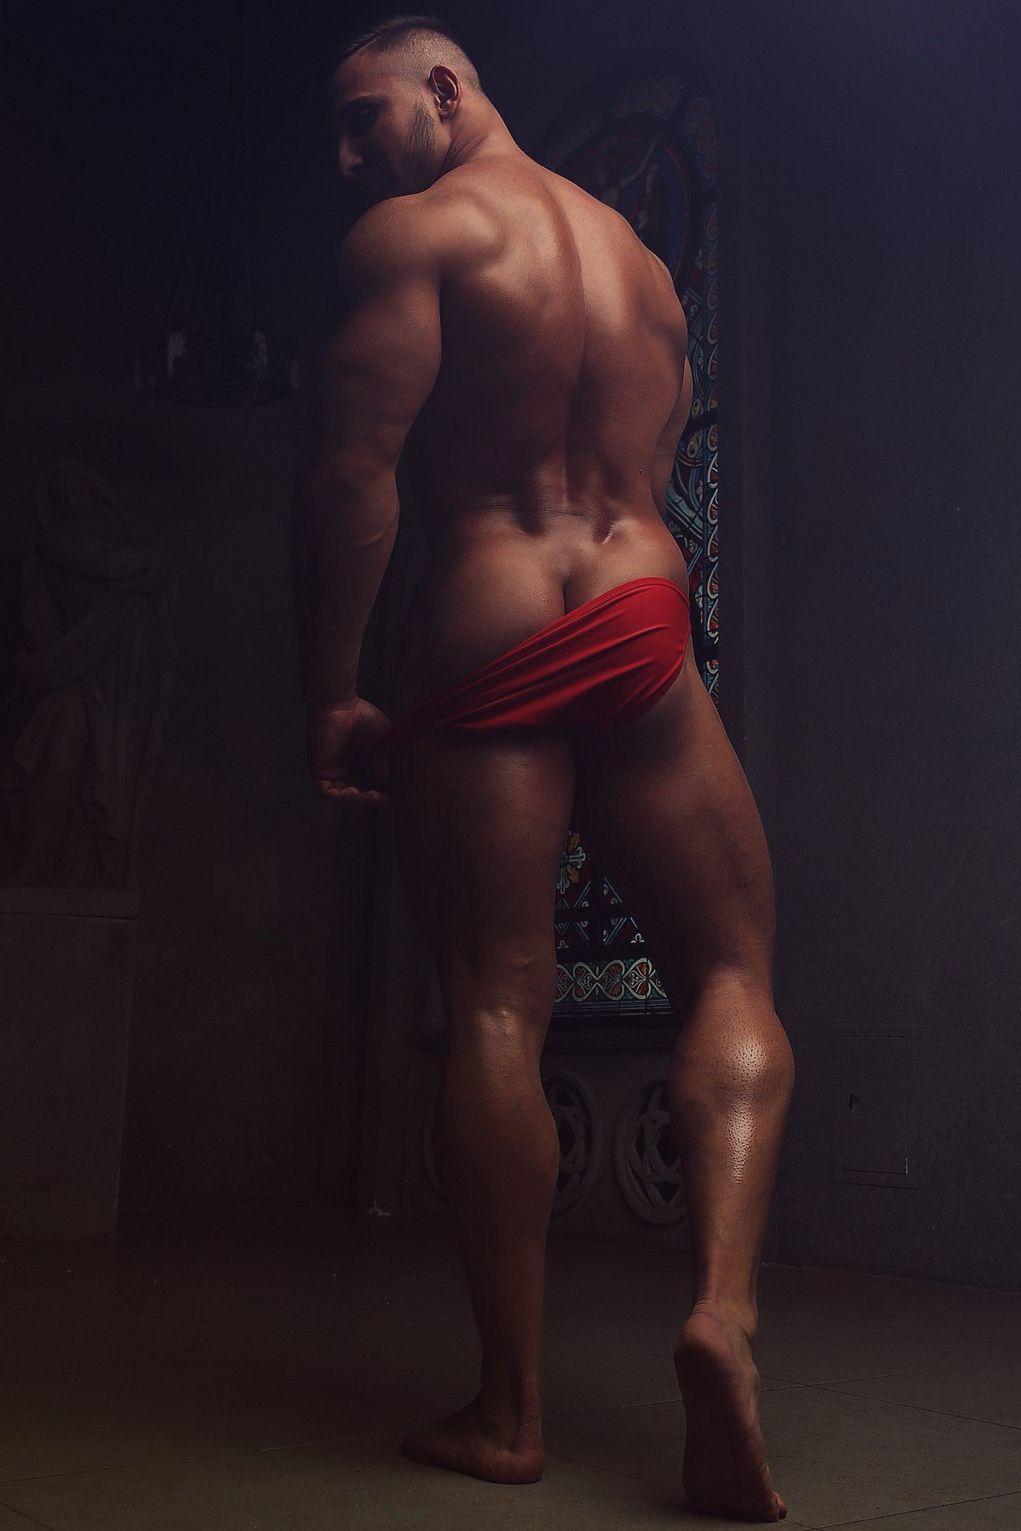 bb51775c24 Male Body, Attractive Men, Phoenix, Bubble, Male Physique, Trunks, Fitness